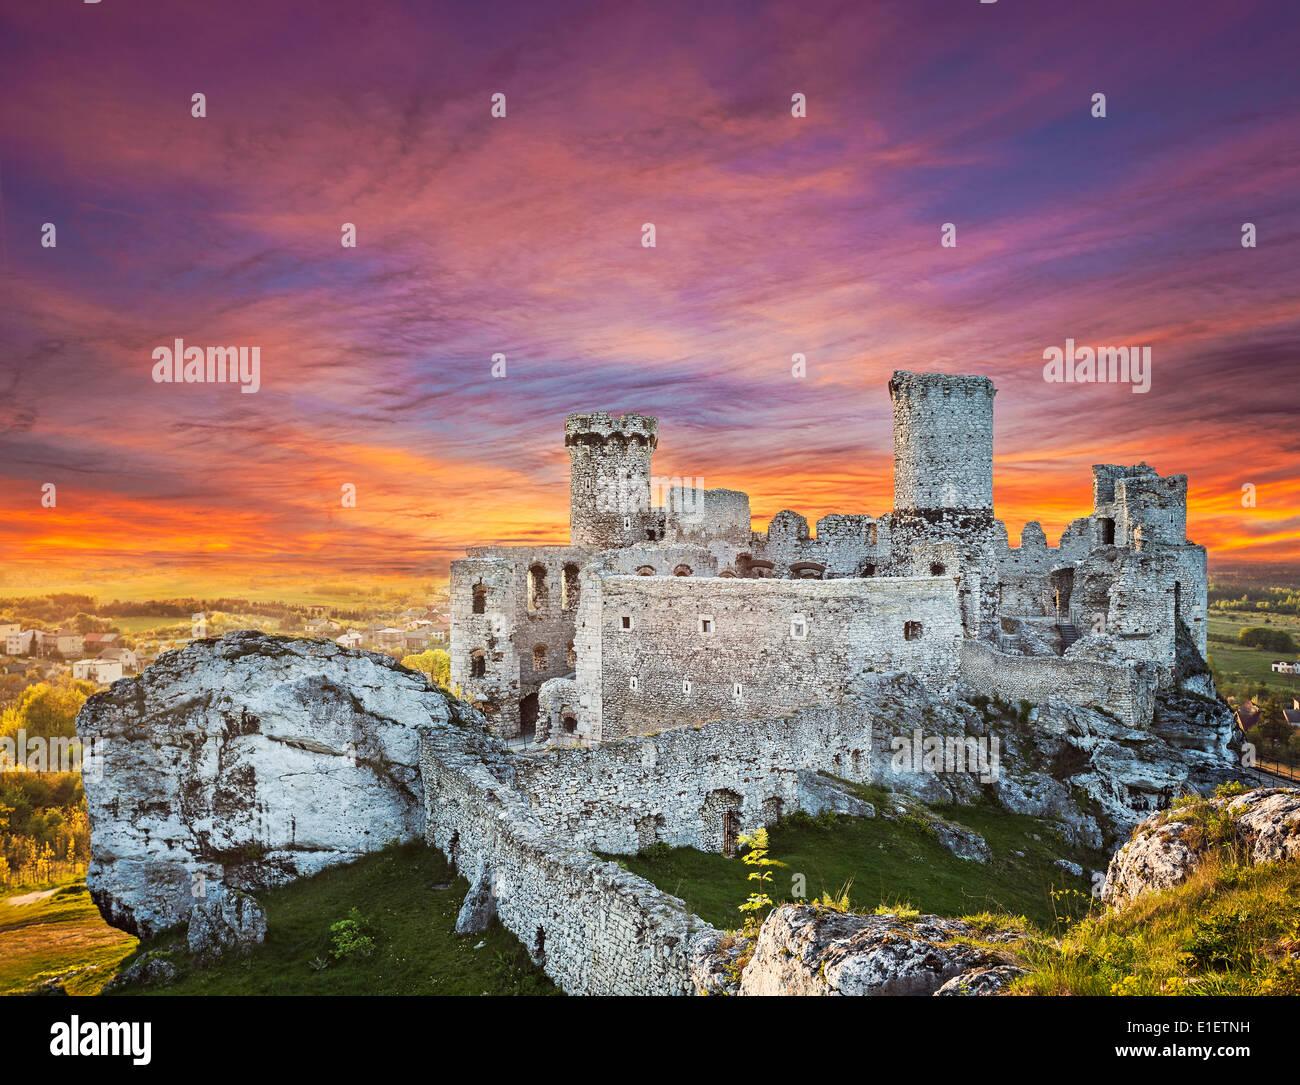 Hermoso atardecer en el castillo Ogrodzieniec, Polonia. Imagen De Stock